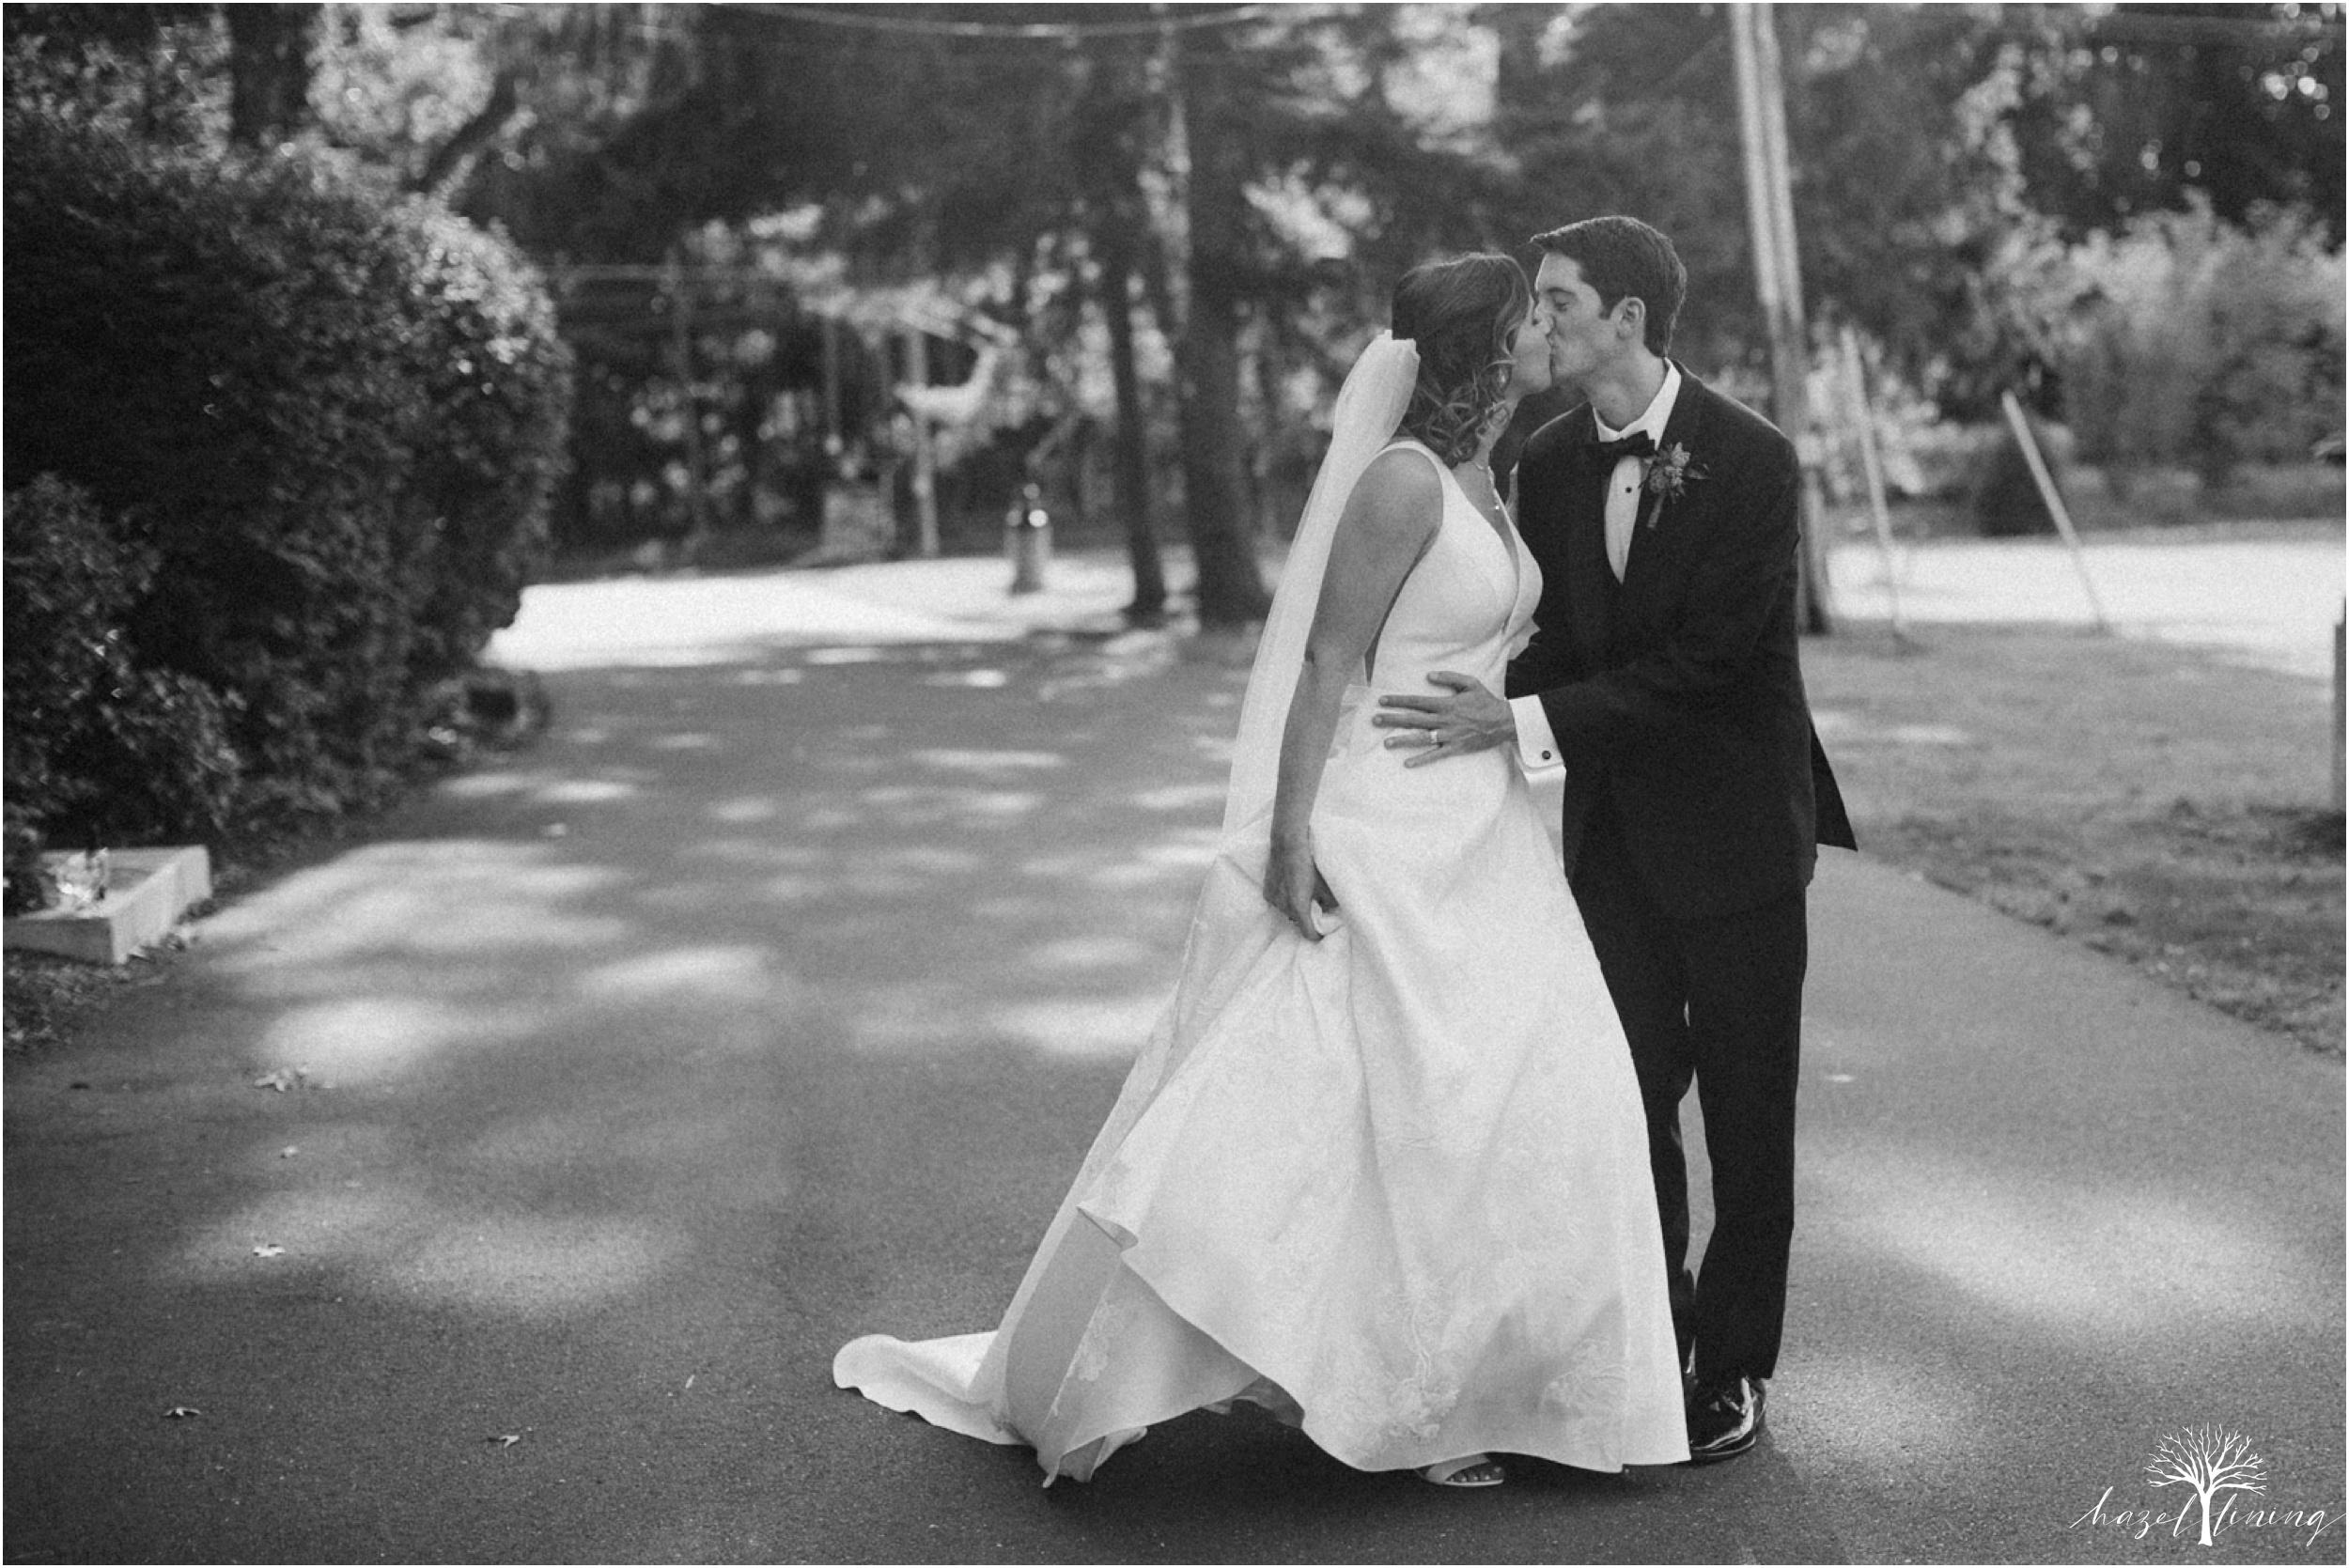 maureen-hepner-anthony-giordano-rose-bank-winery-newtow-pennsylvania-luxury-summer-wedding-hazel-lining-photography-destination-elopement-wedding-engagement-photography_0099.jpg